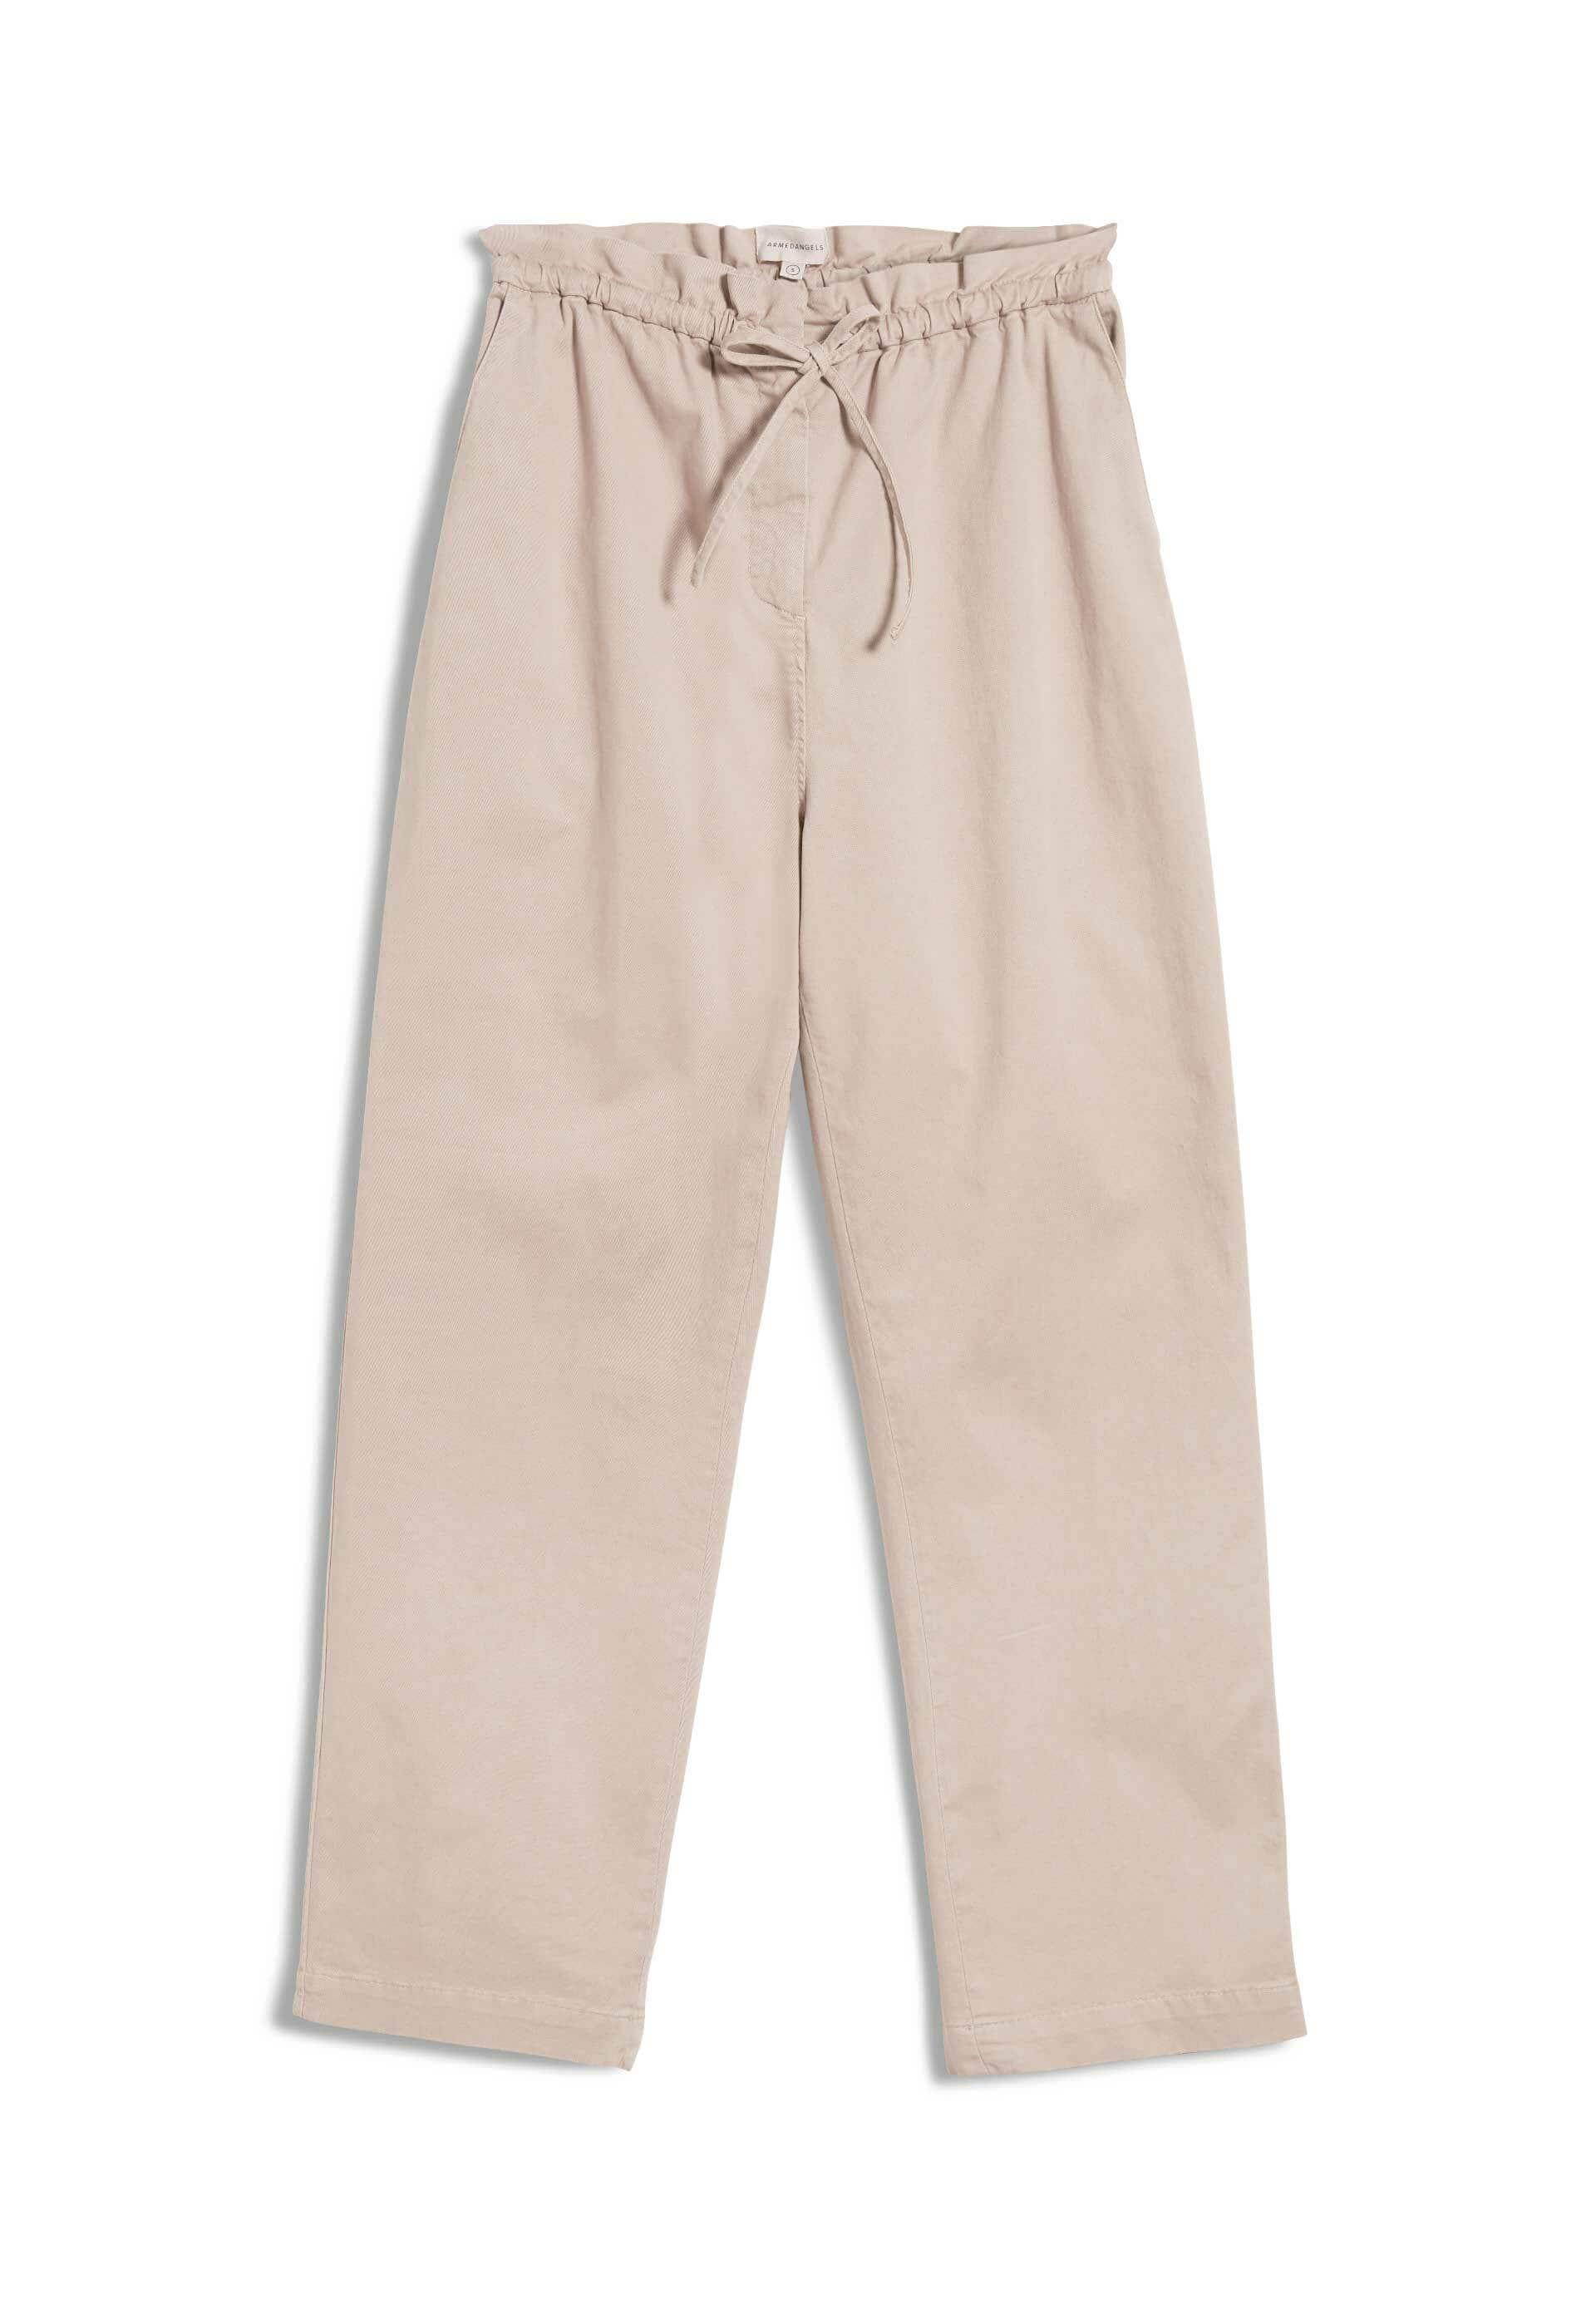 SABINAA Pantalon en coton biologique mélangé